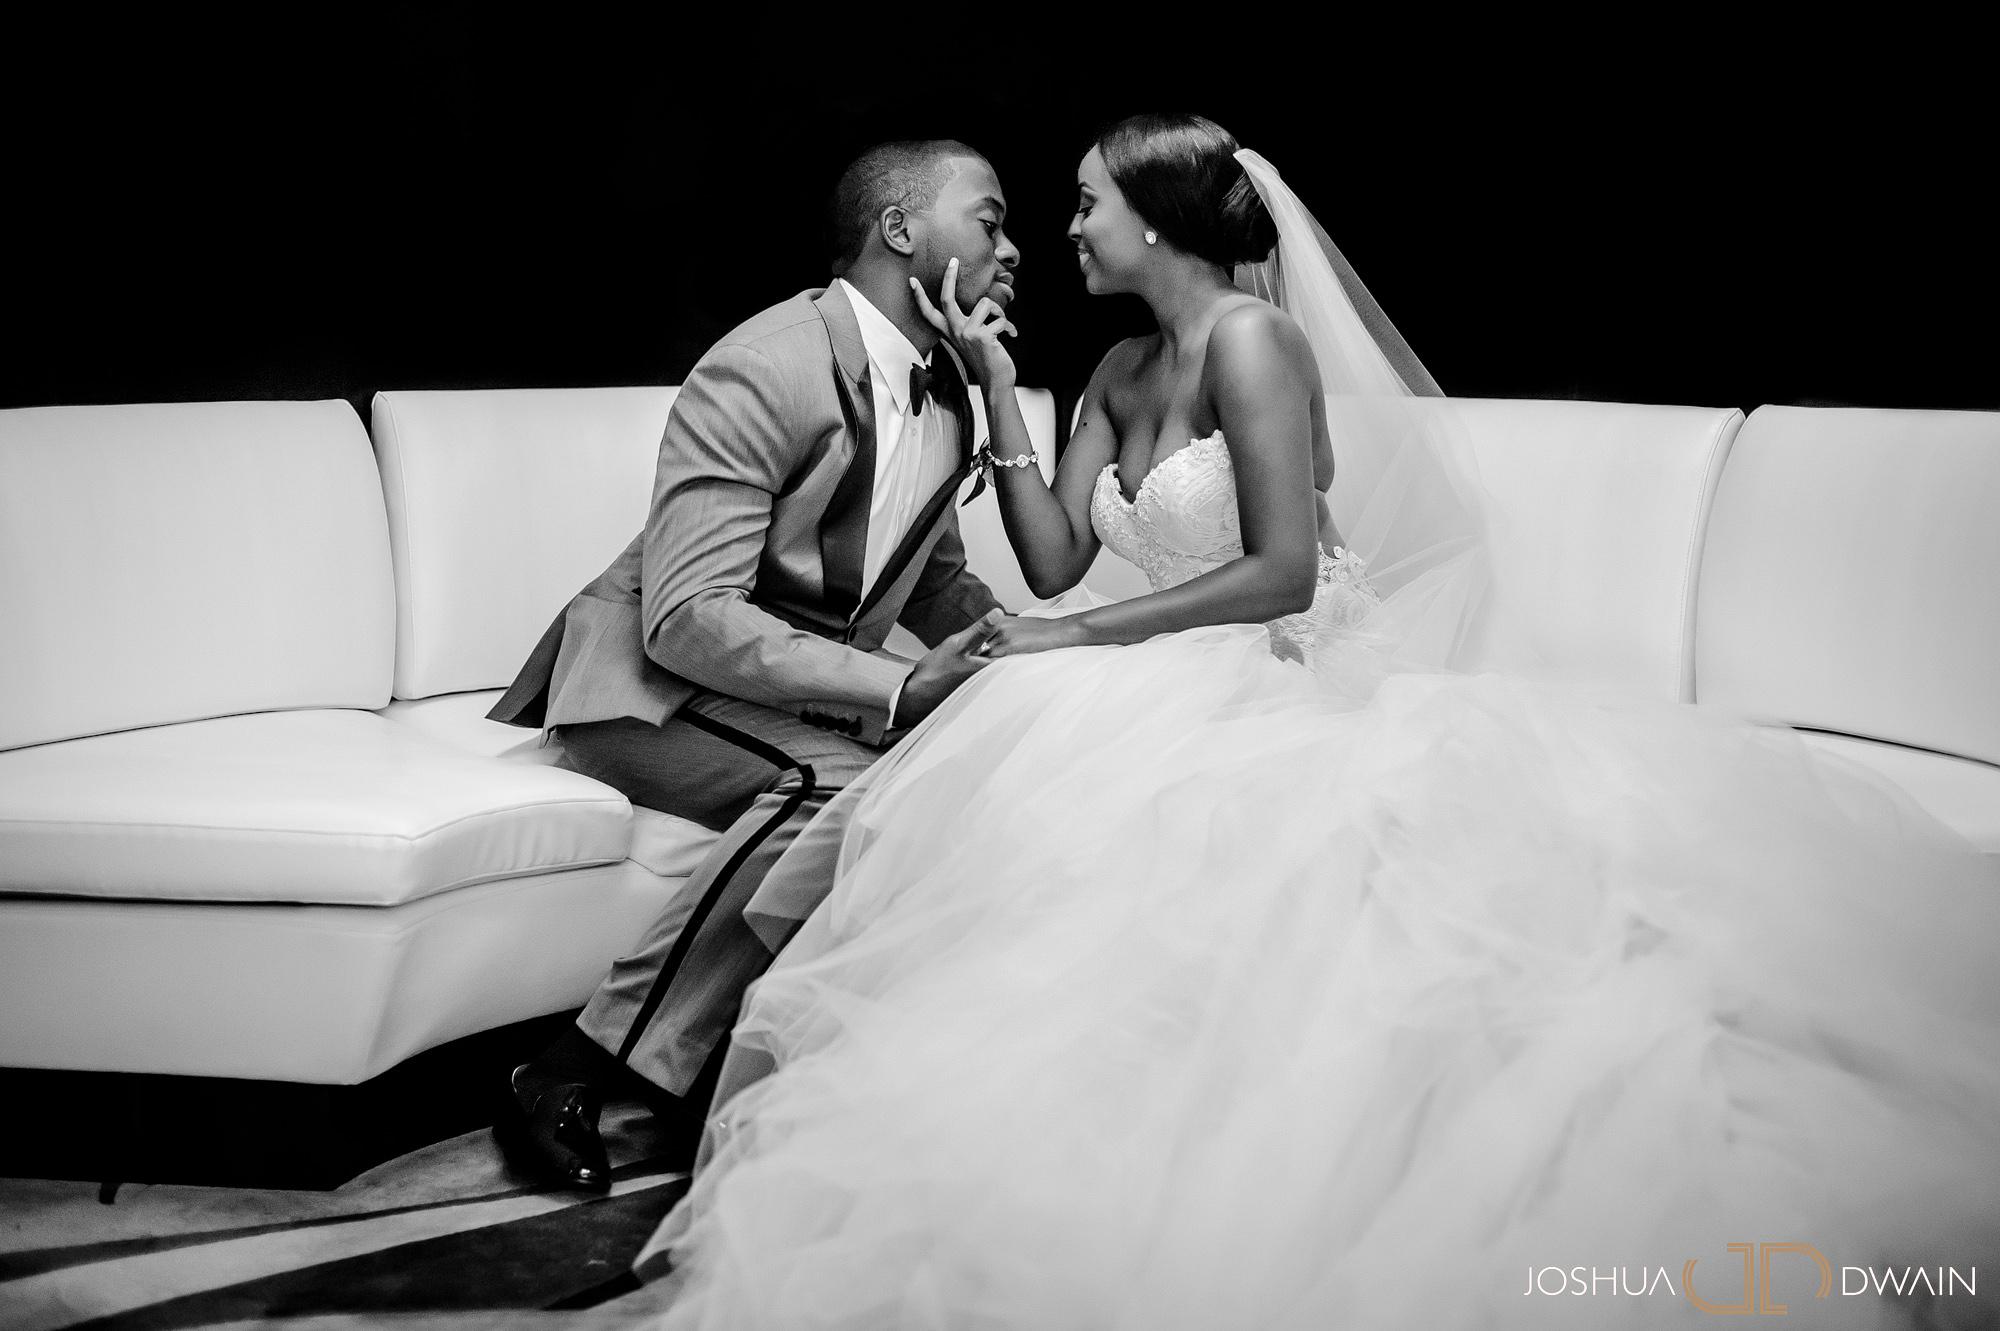 joshua-dwain-weddings-gallery-best-wedding-photographers-us-057